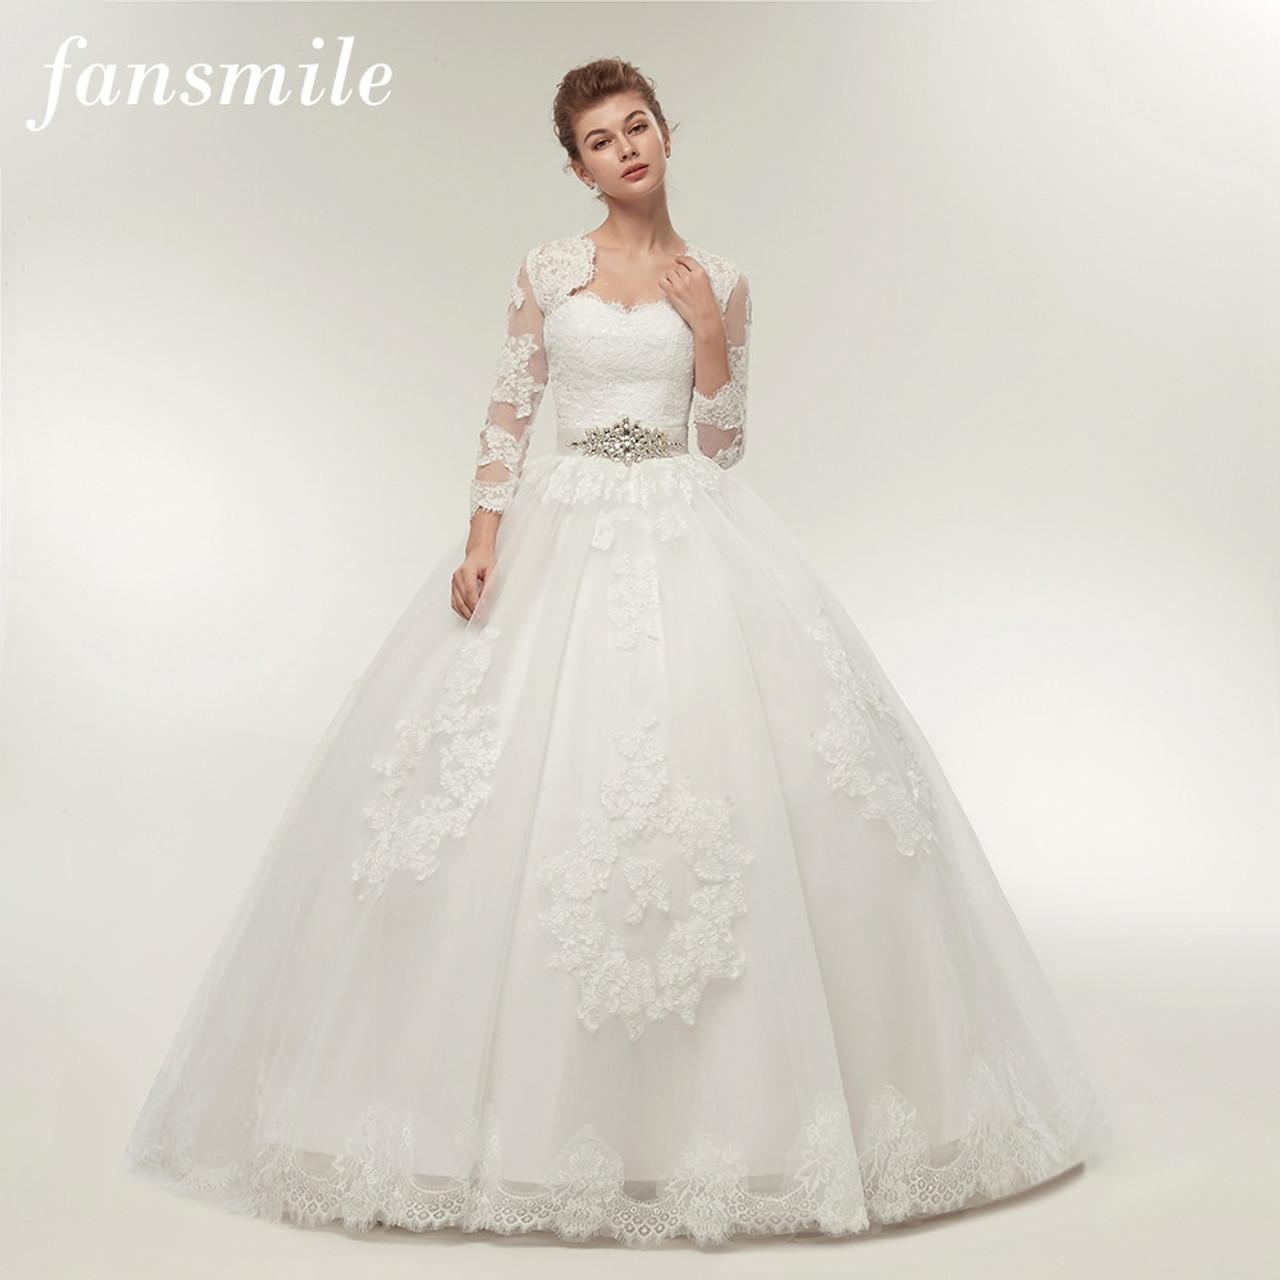 Fansmile Two Piece Long Sleeve Jacket Wedding Dresses 2019 Plus Size Bridal Ball Gowns Vestido De Noiva Robe De Mariage Fsm 122t